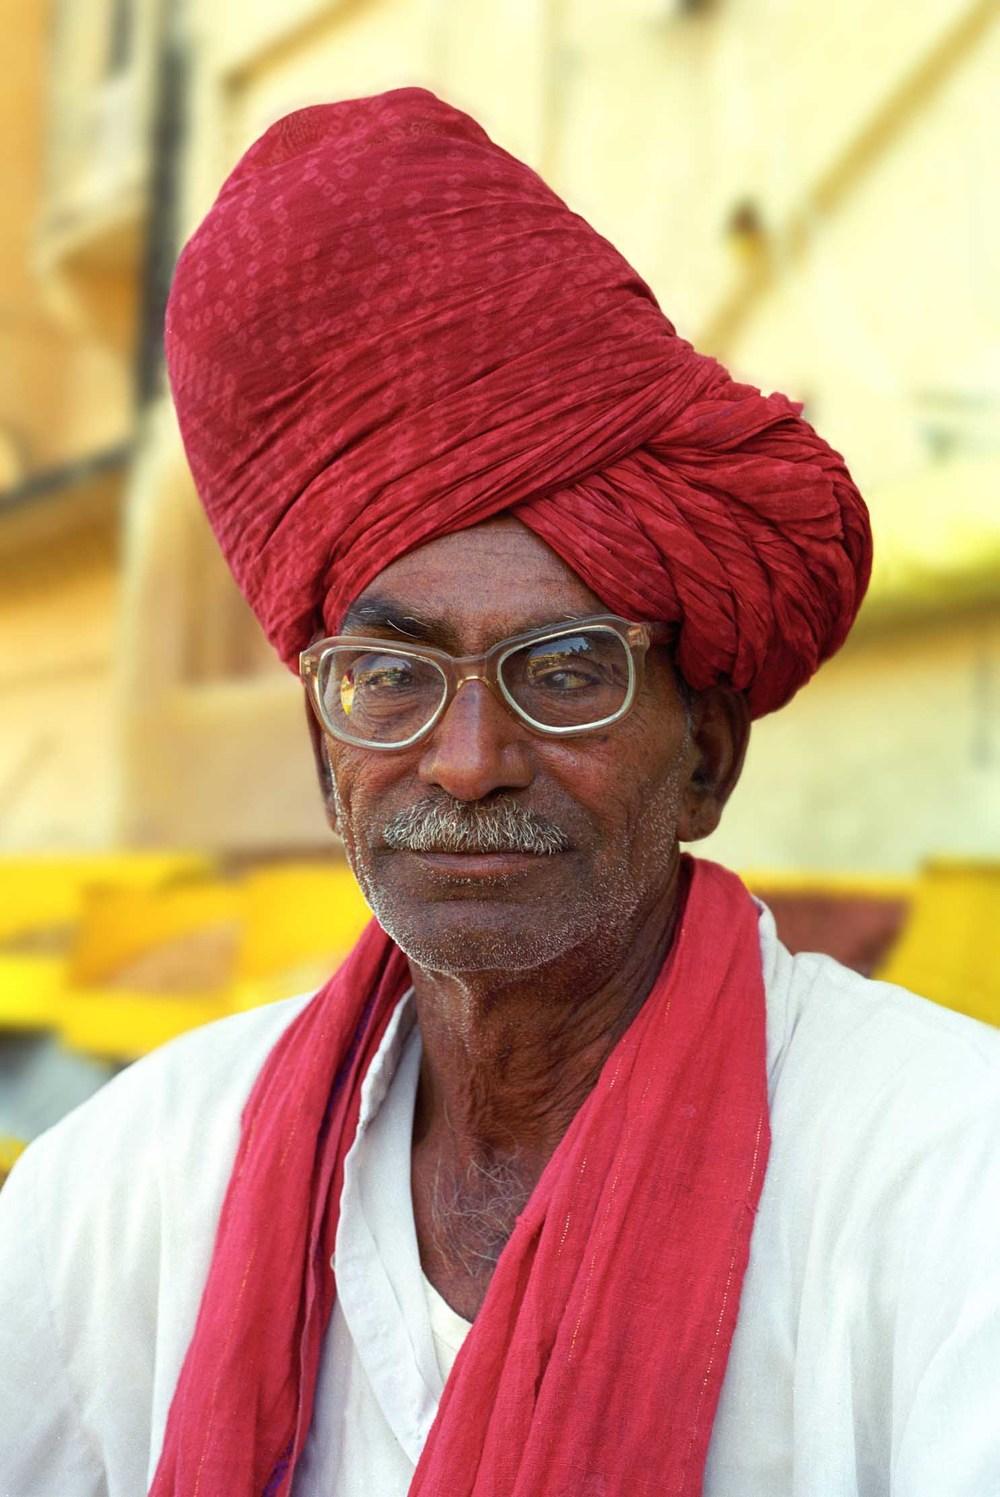 Spice seller at the Amber Fort, Jaipur